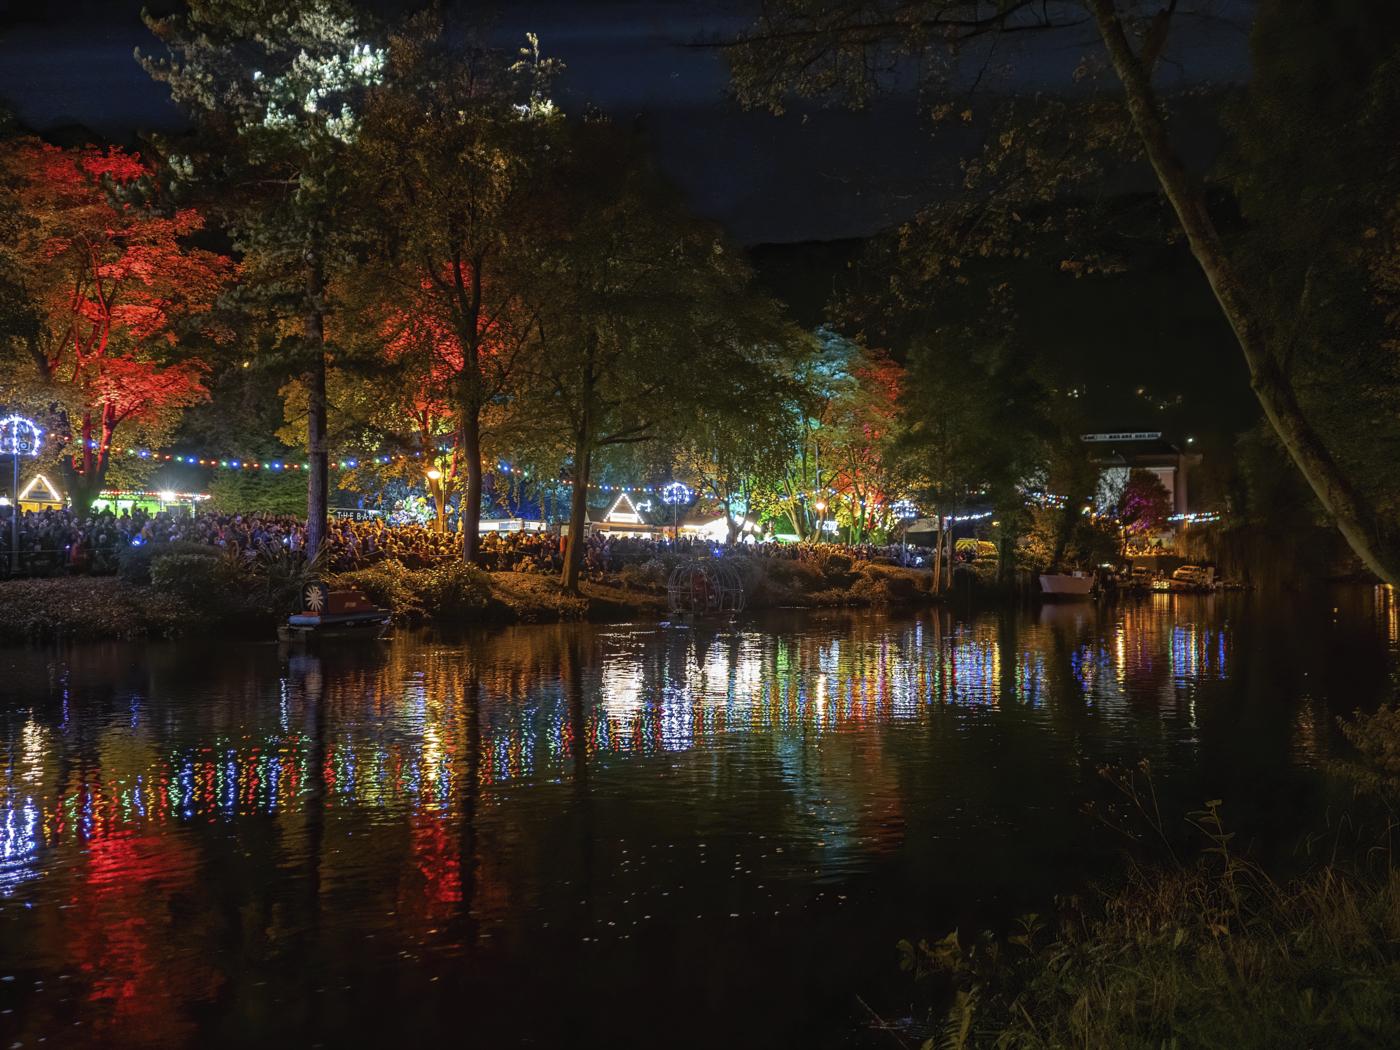 Matlock Bath, riverside festival